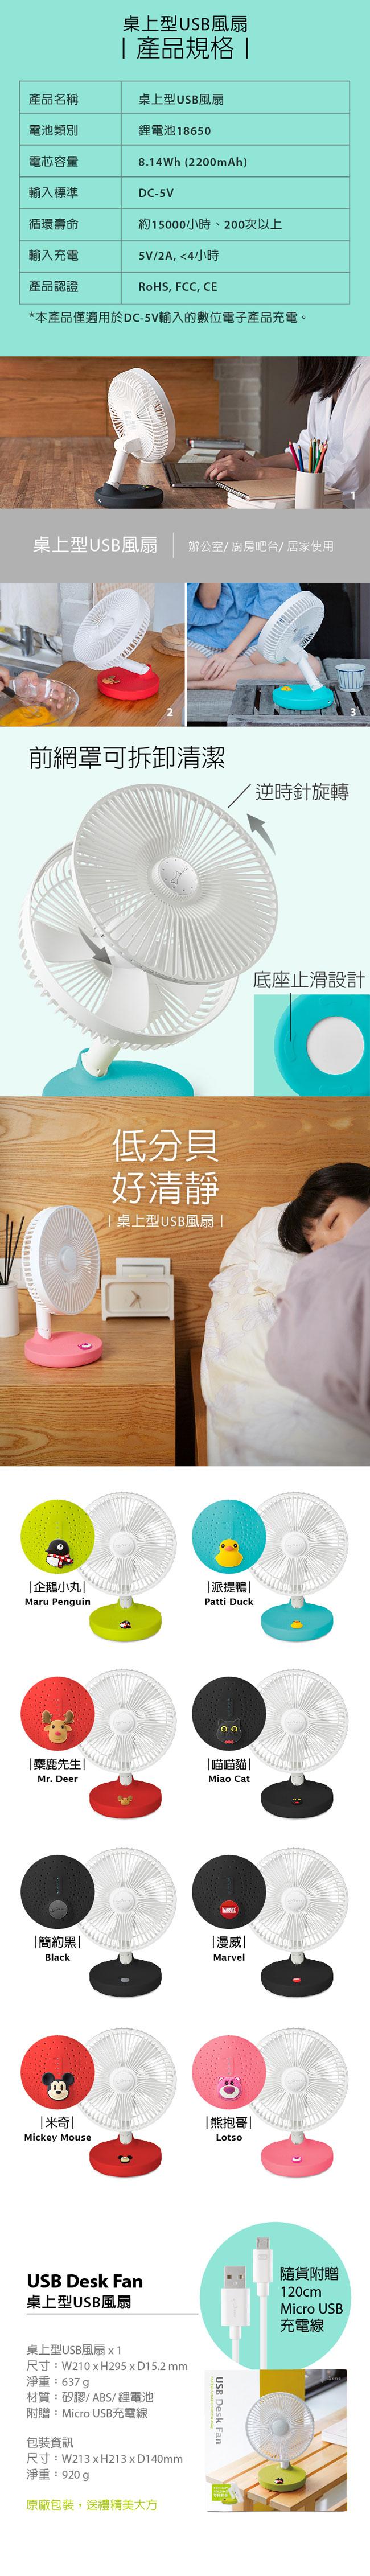 Bone|桌上型USB風扇 / USB Desk Fan - 米奇